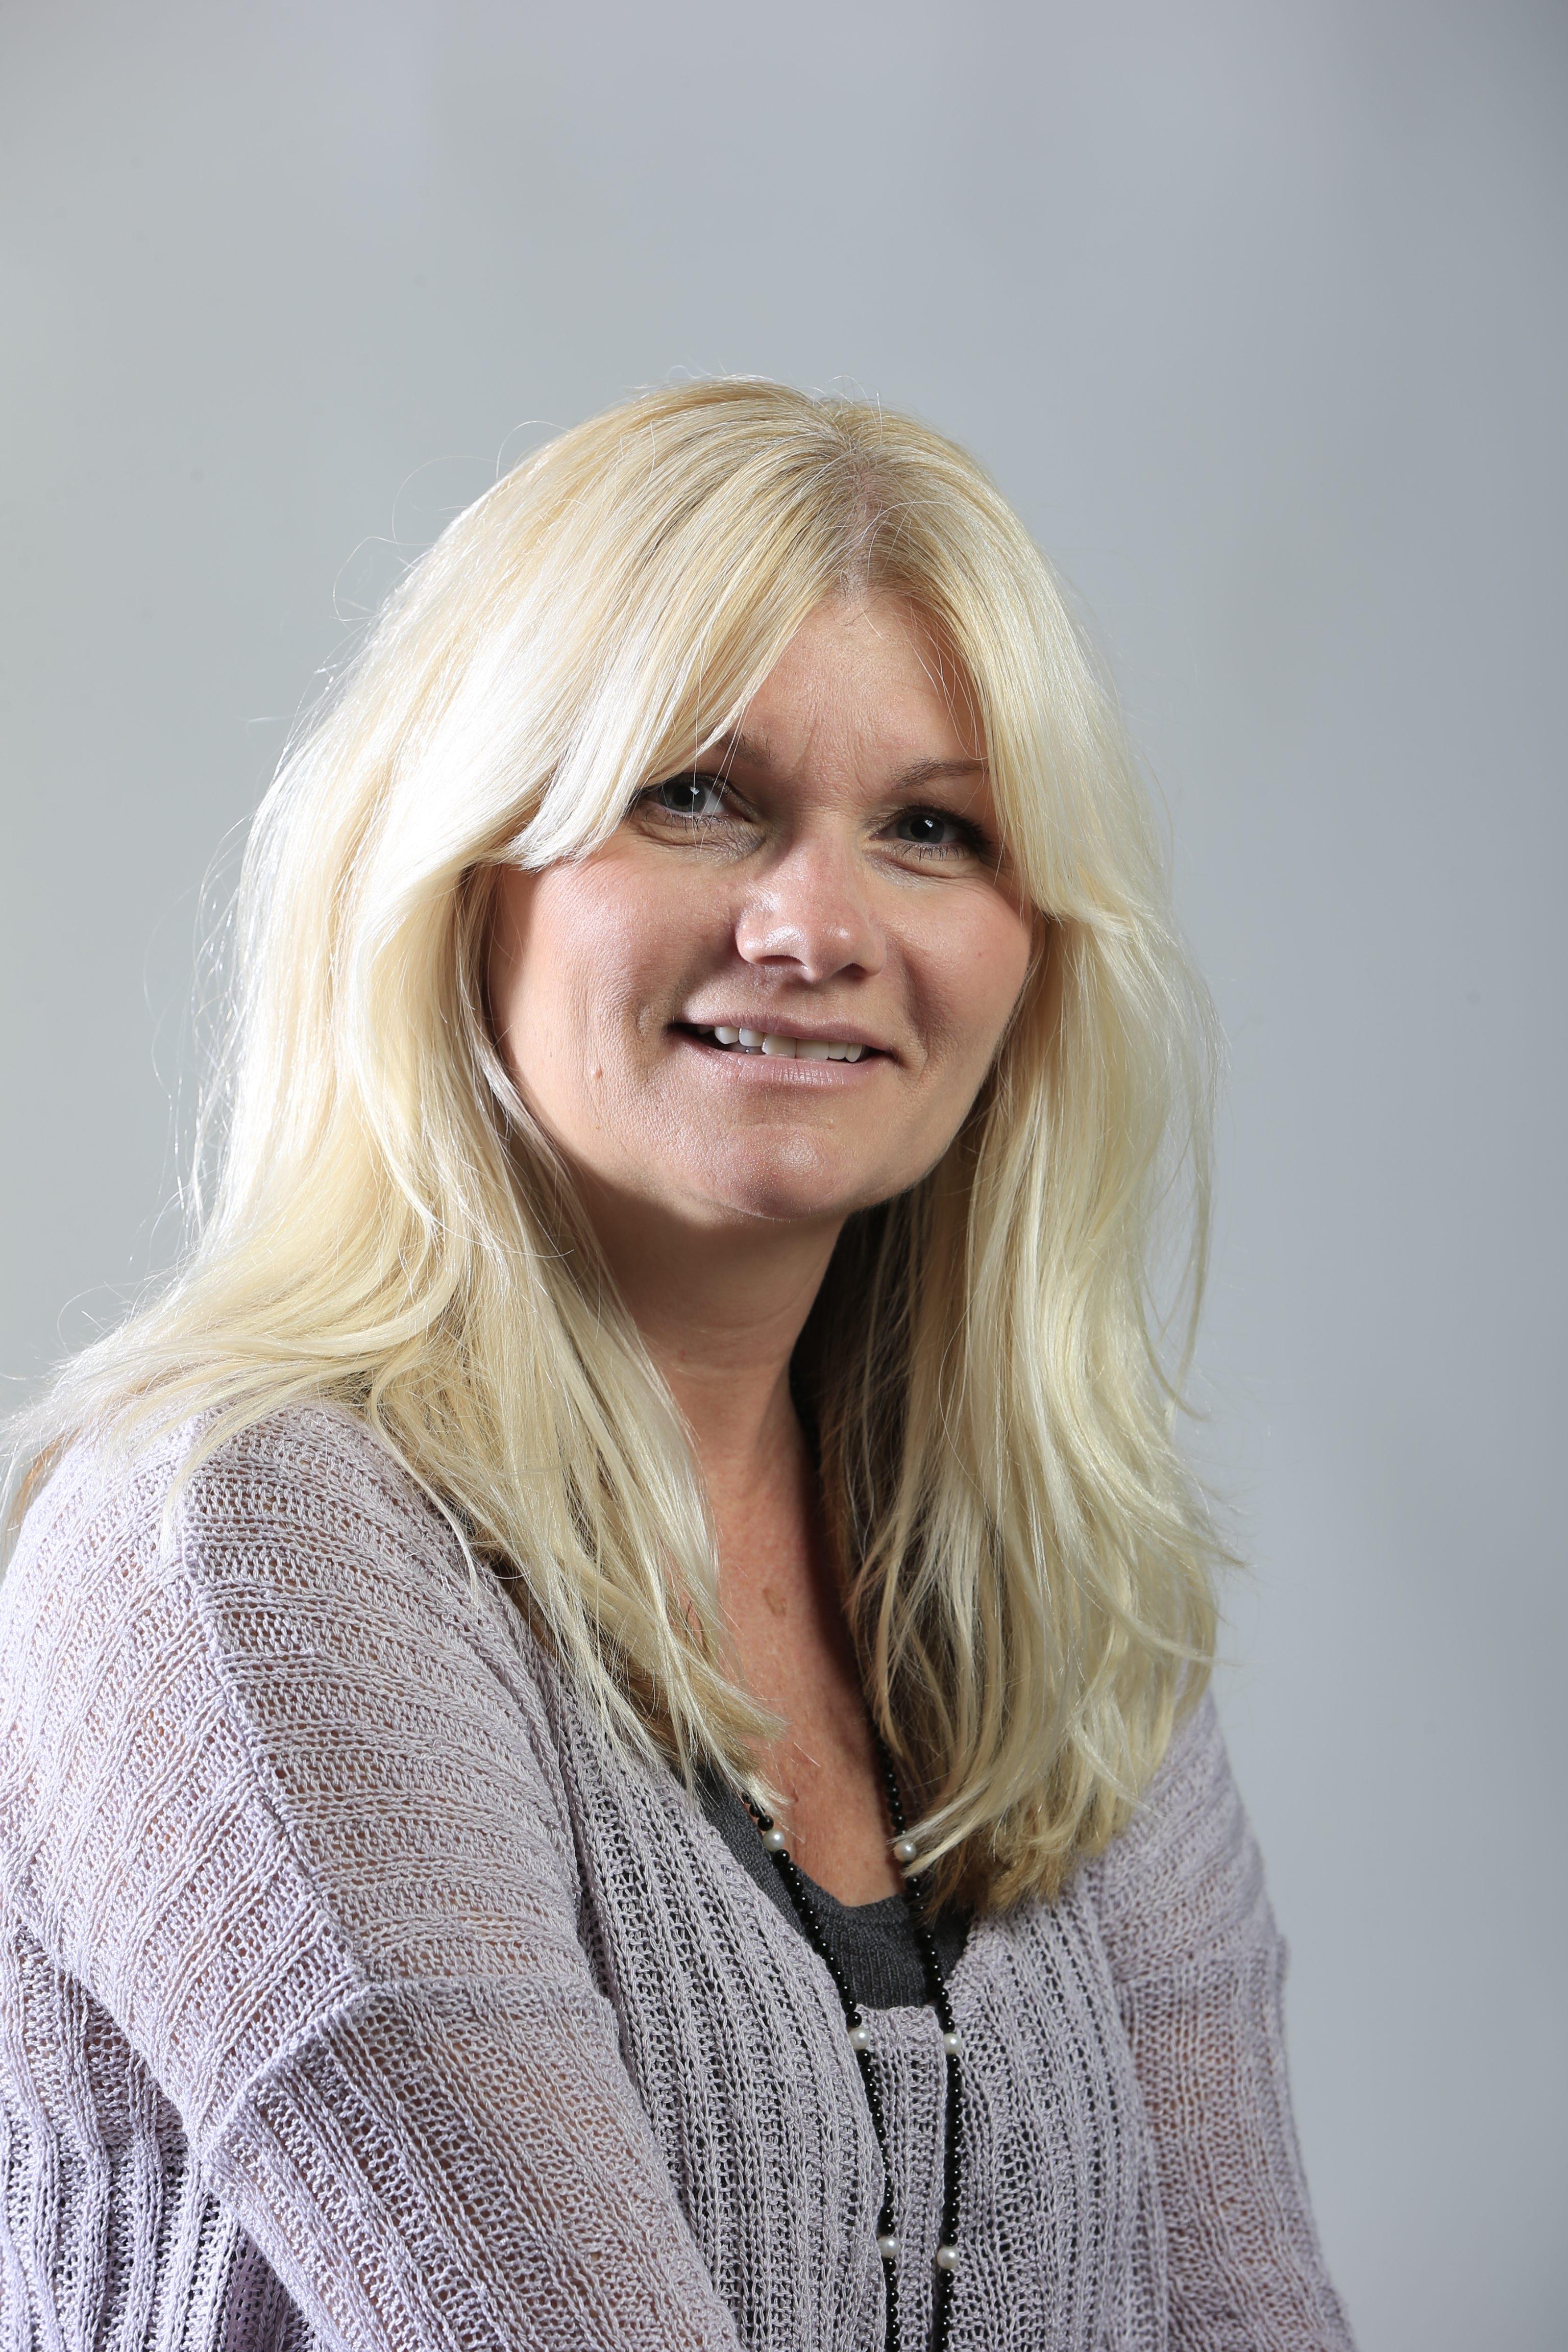 Janine Talley is a Buffalo News guest columnist.